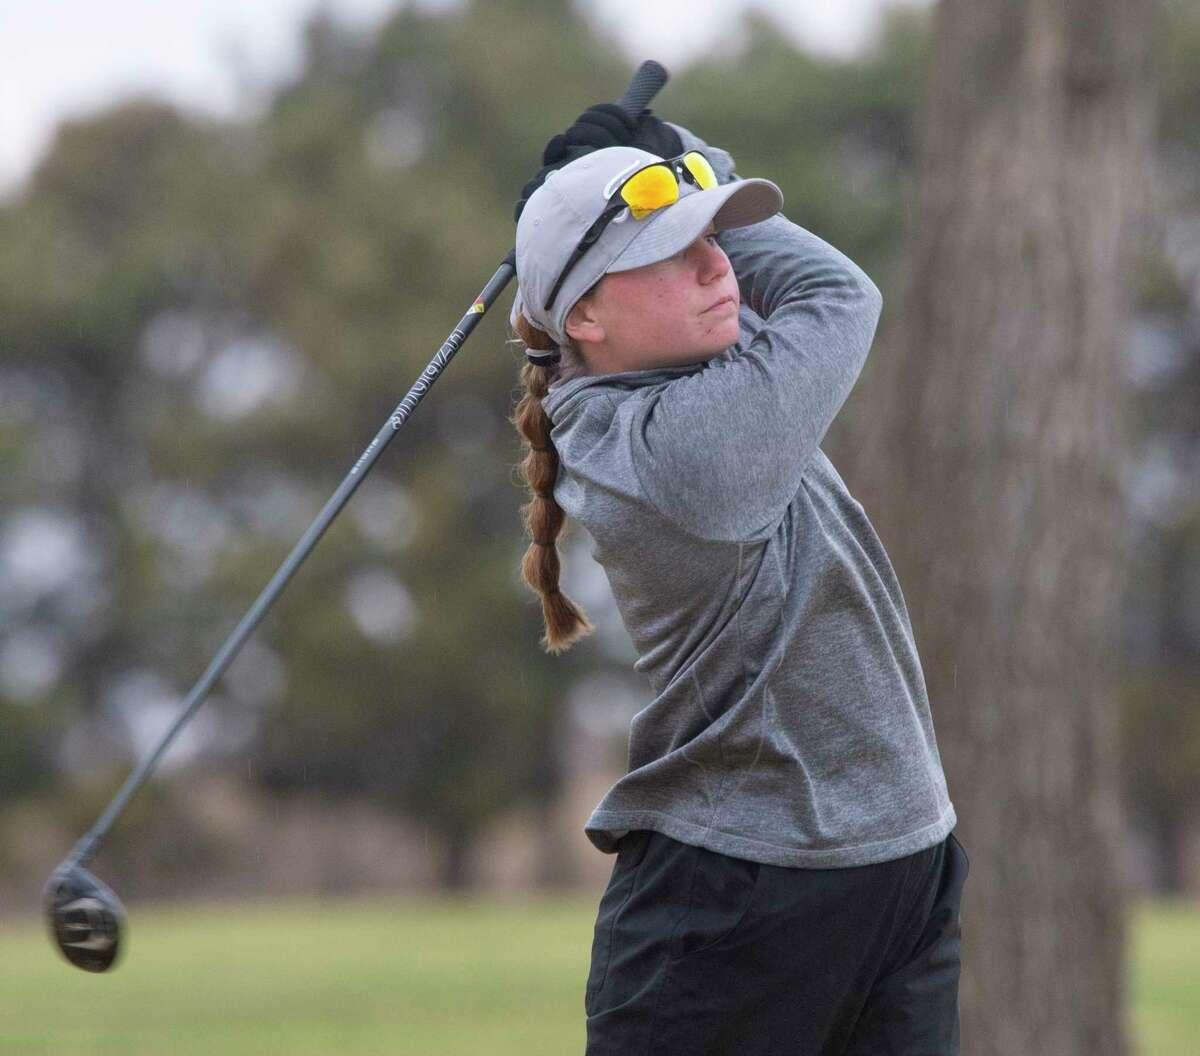 Lee High's Sarah Reed follows her shot 03/22/21 during the District 2-6A tournament at Ranchland Hills Golf Club. Tim Fischer/Reporter-Telegram